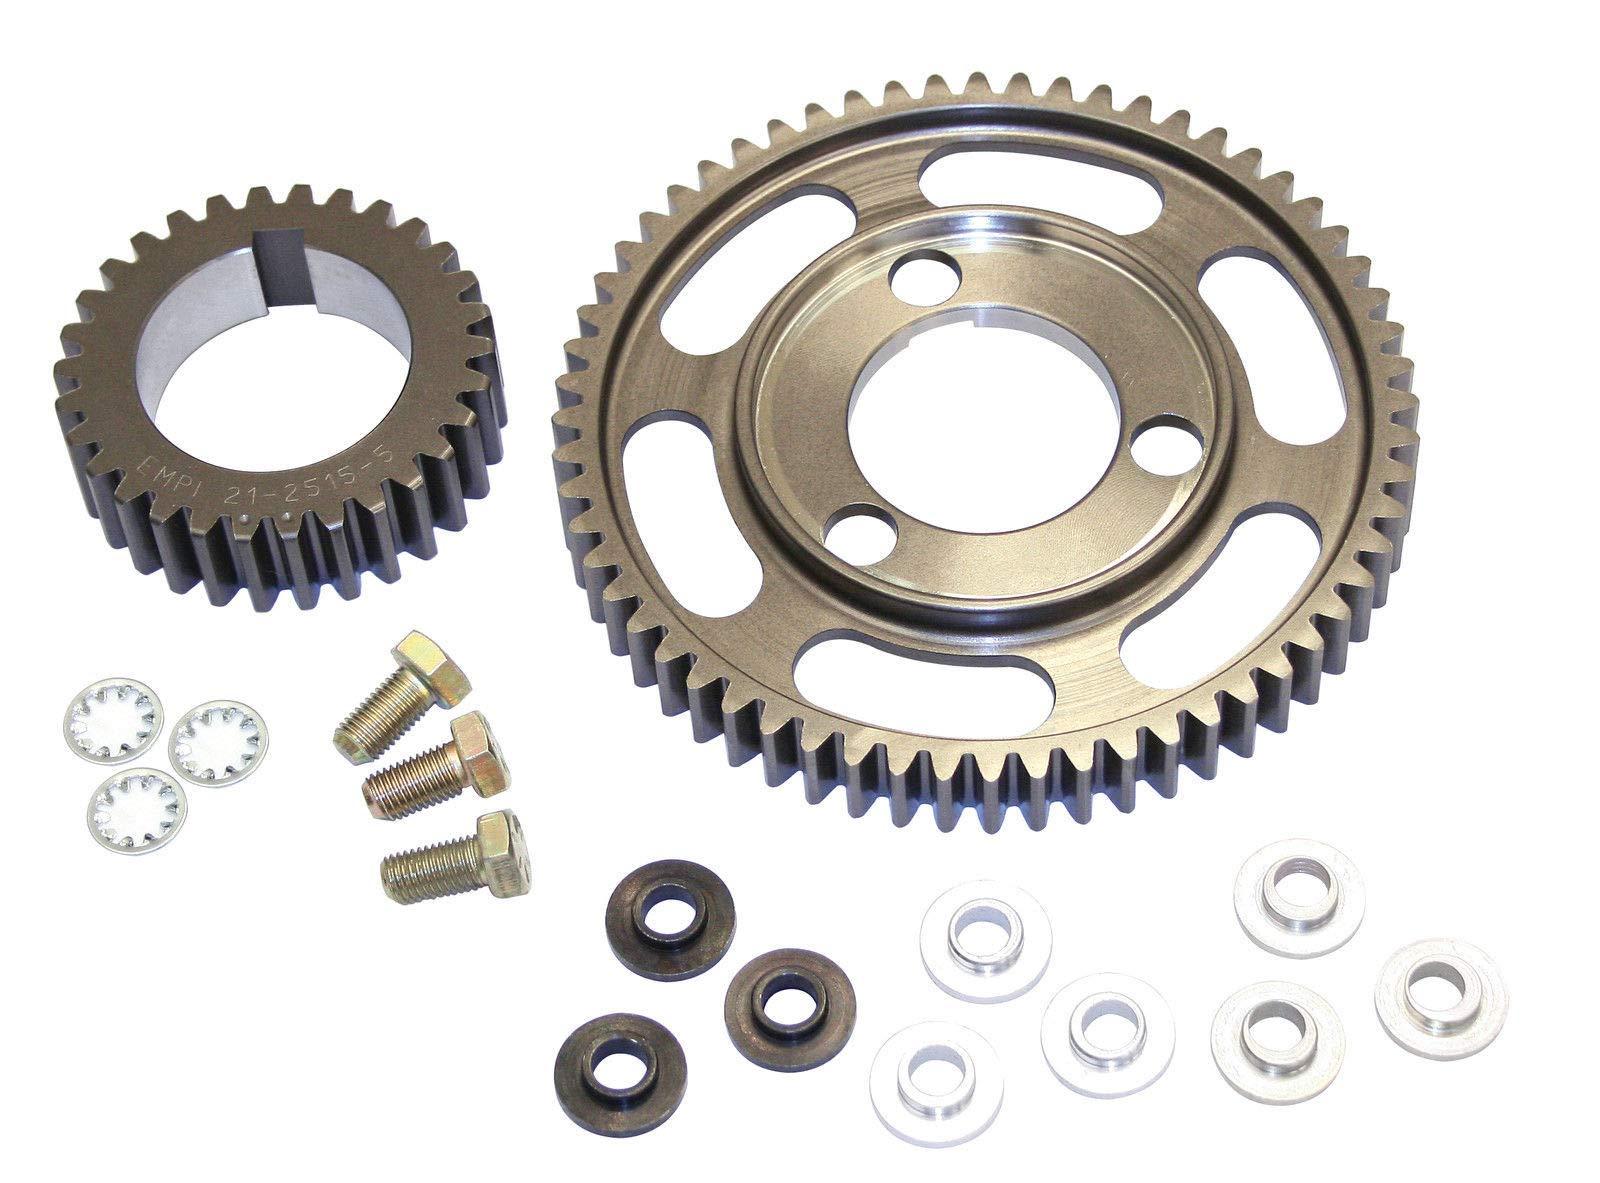 E-cowlboy 3163021 Cam Timing Tool Kit+3163530 Engine Brake Adjustment Tool 7MM for Cummins ISX Engine Heavy Duty Steel 15 PCS